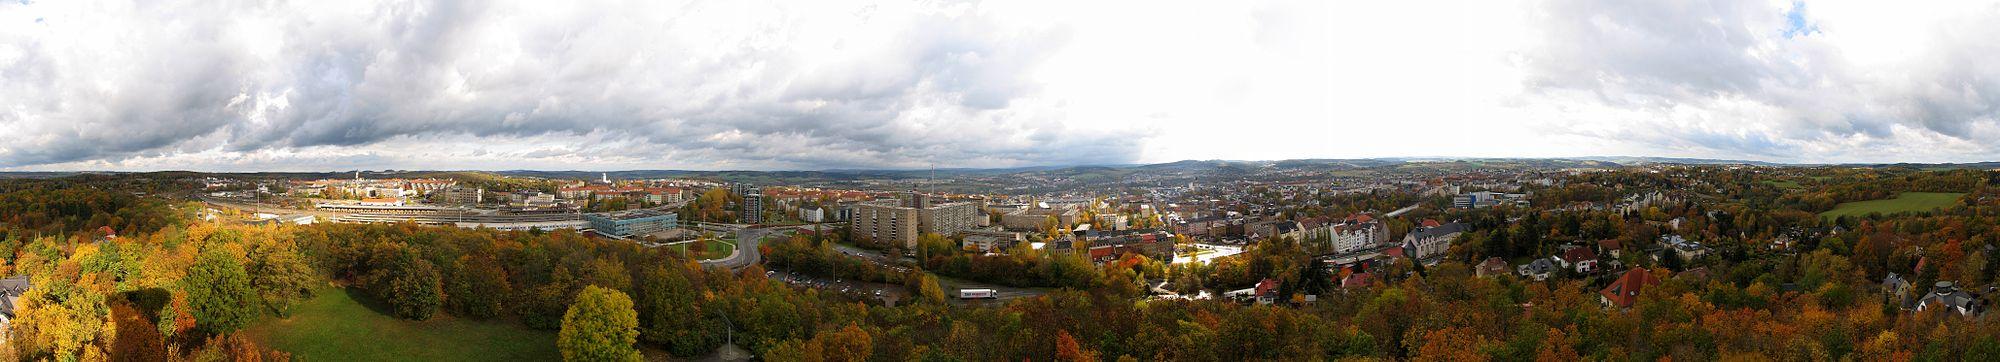 Панорама города Плауэн